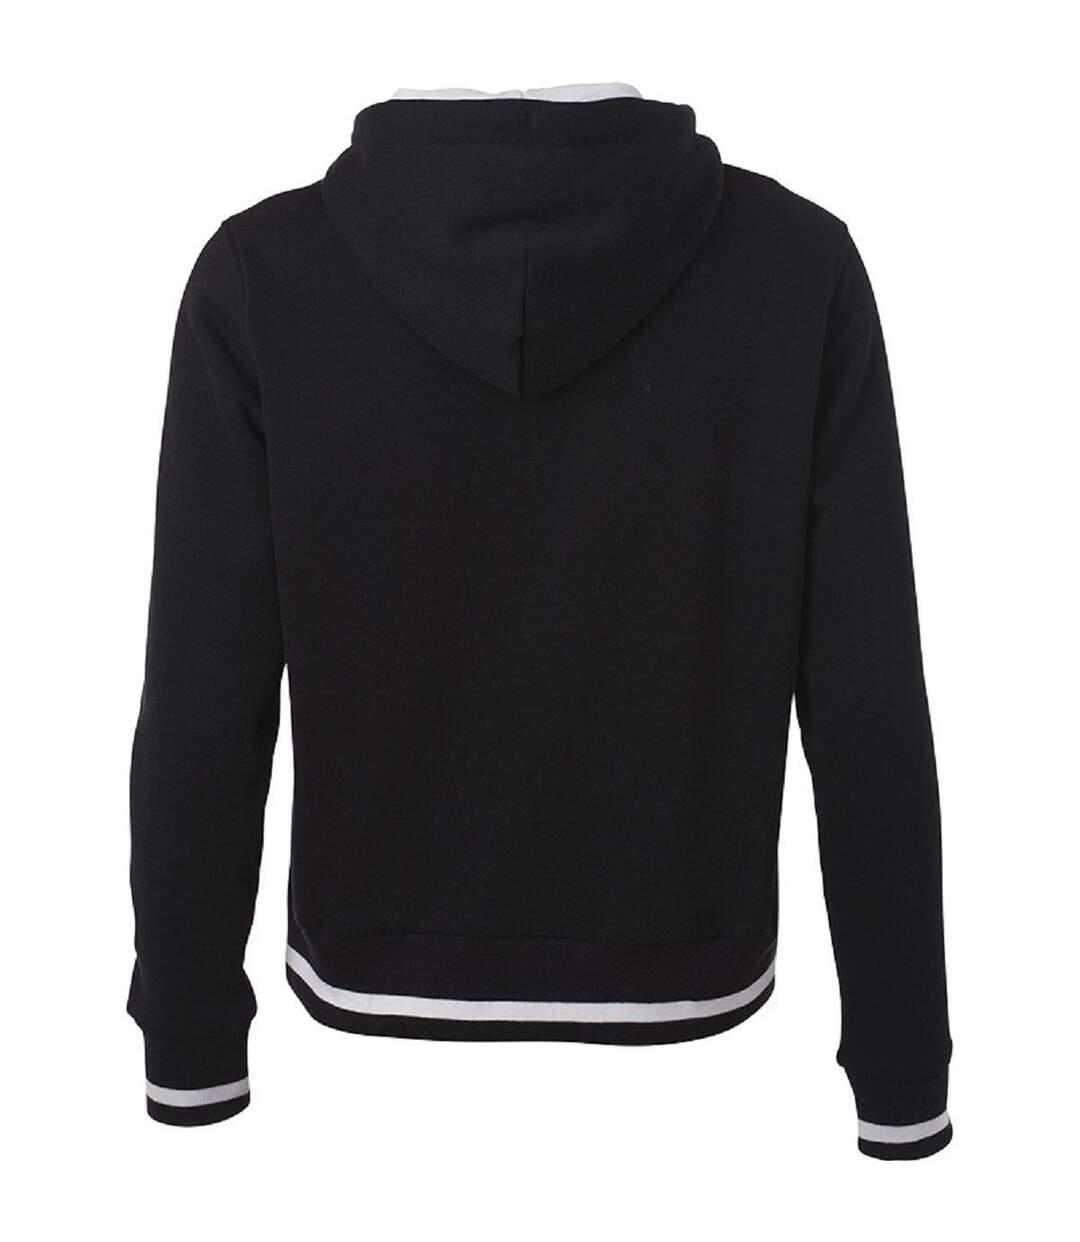 Dégagement Sweat shirt à capuche femme JN777 noir dsf.d455nksdKLFHG